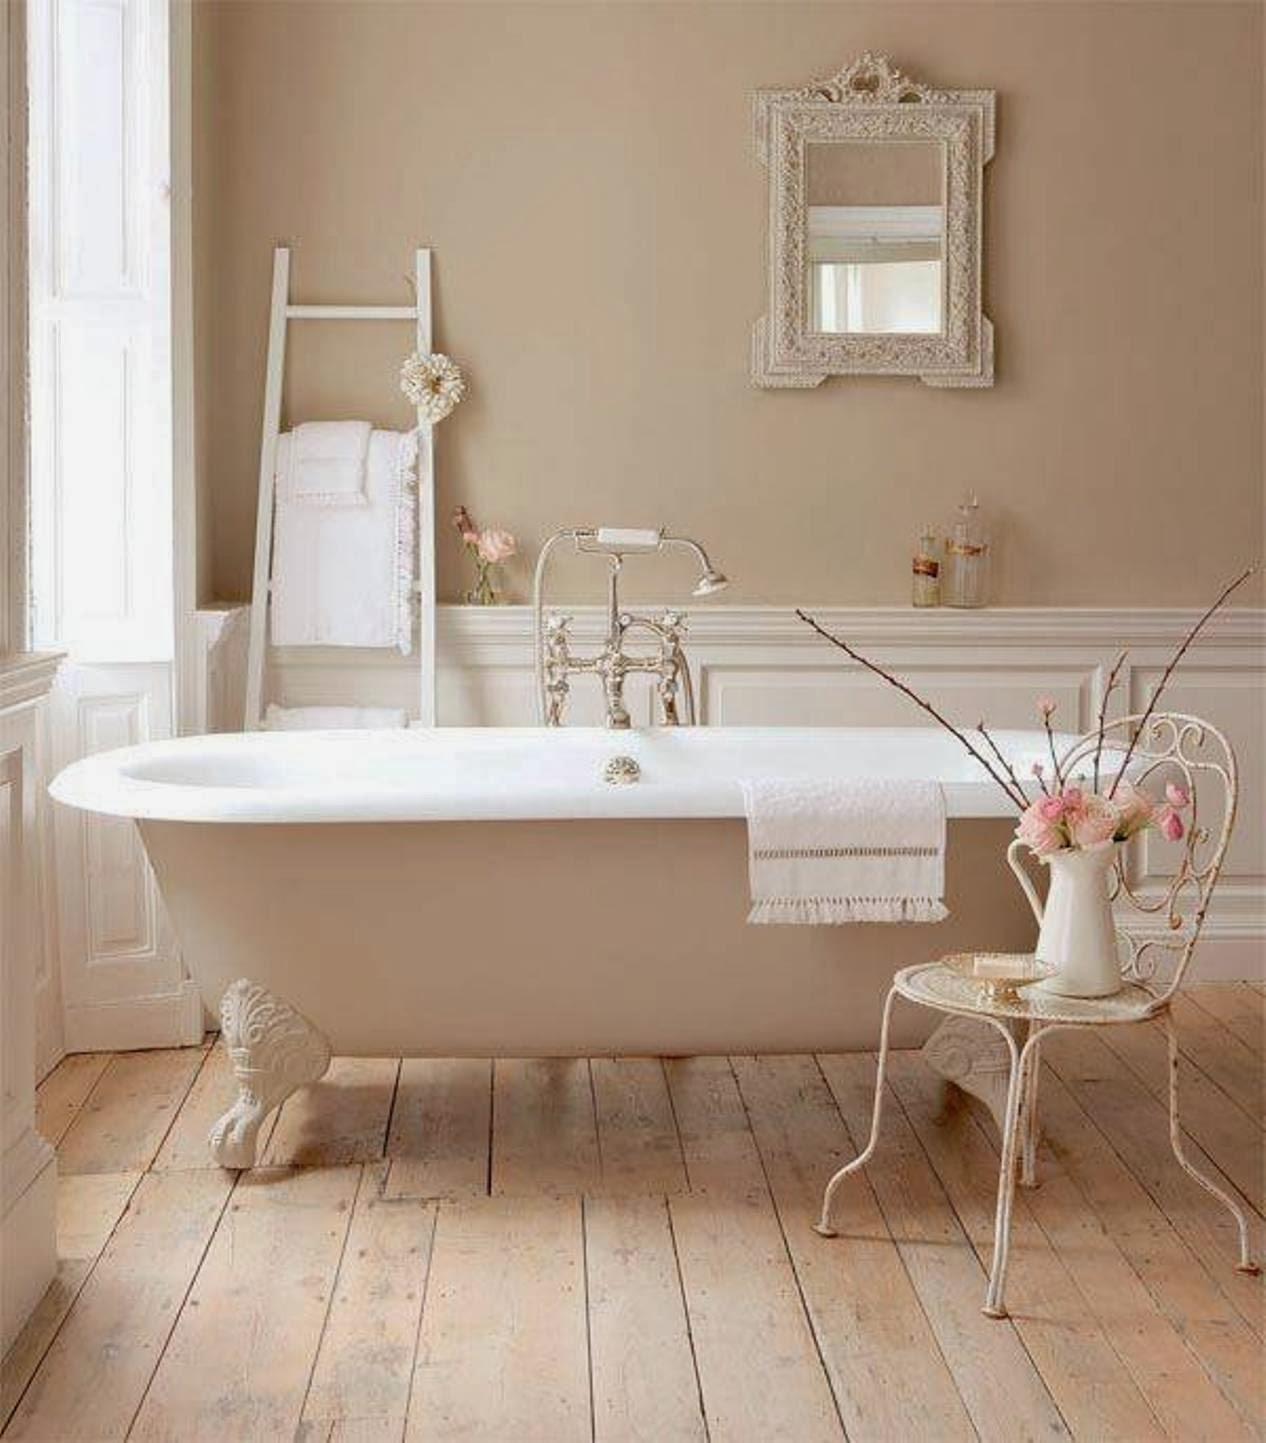 Vasca da bagno romantica con candele : vasca da bagno in ...